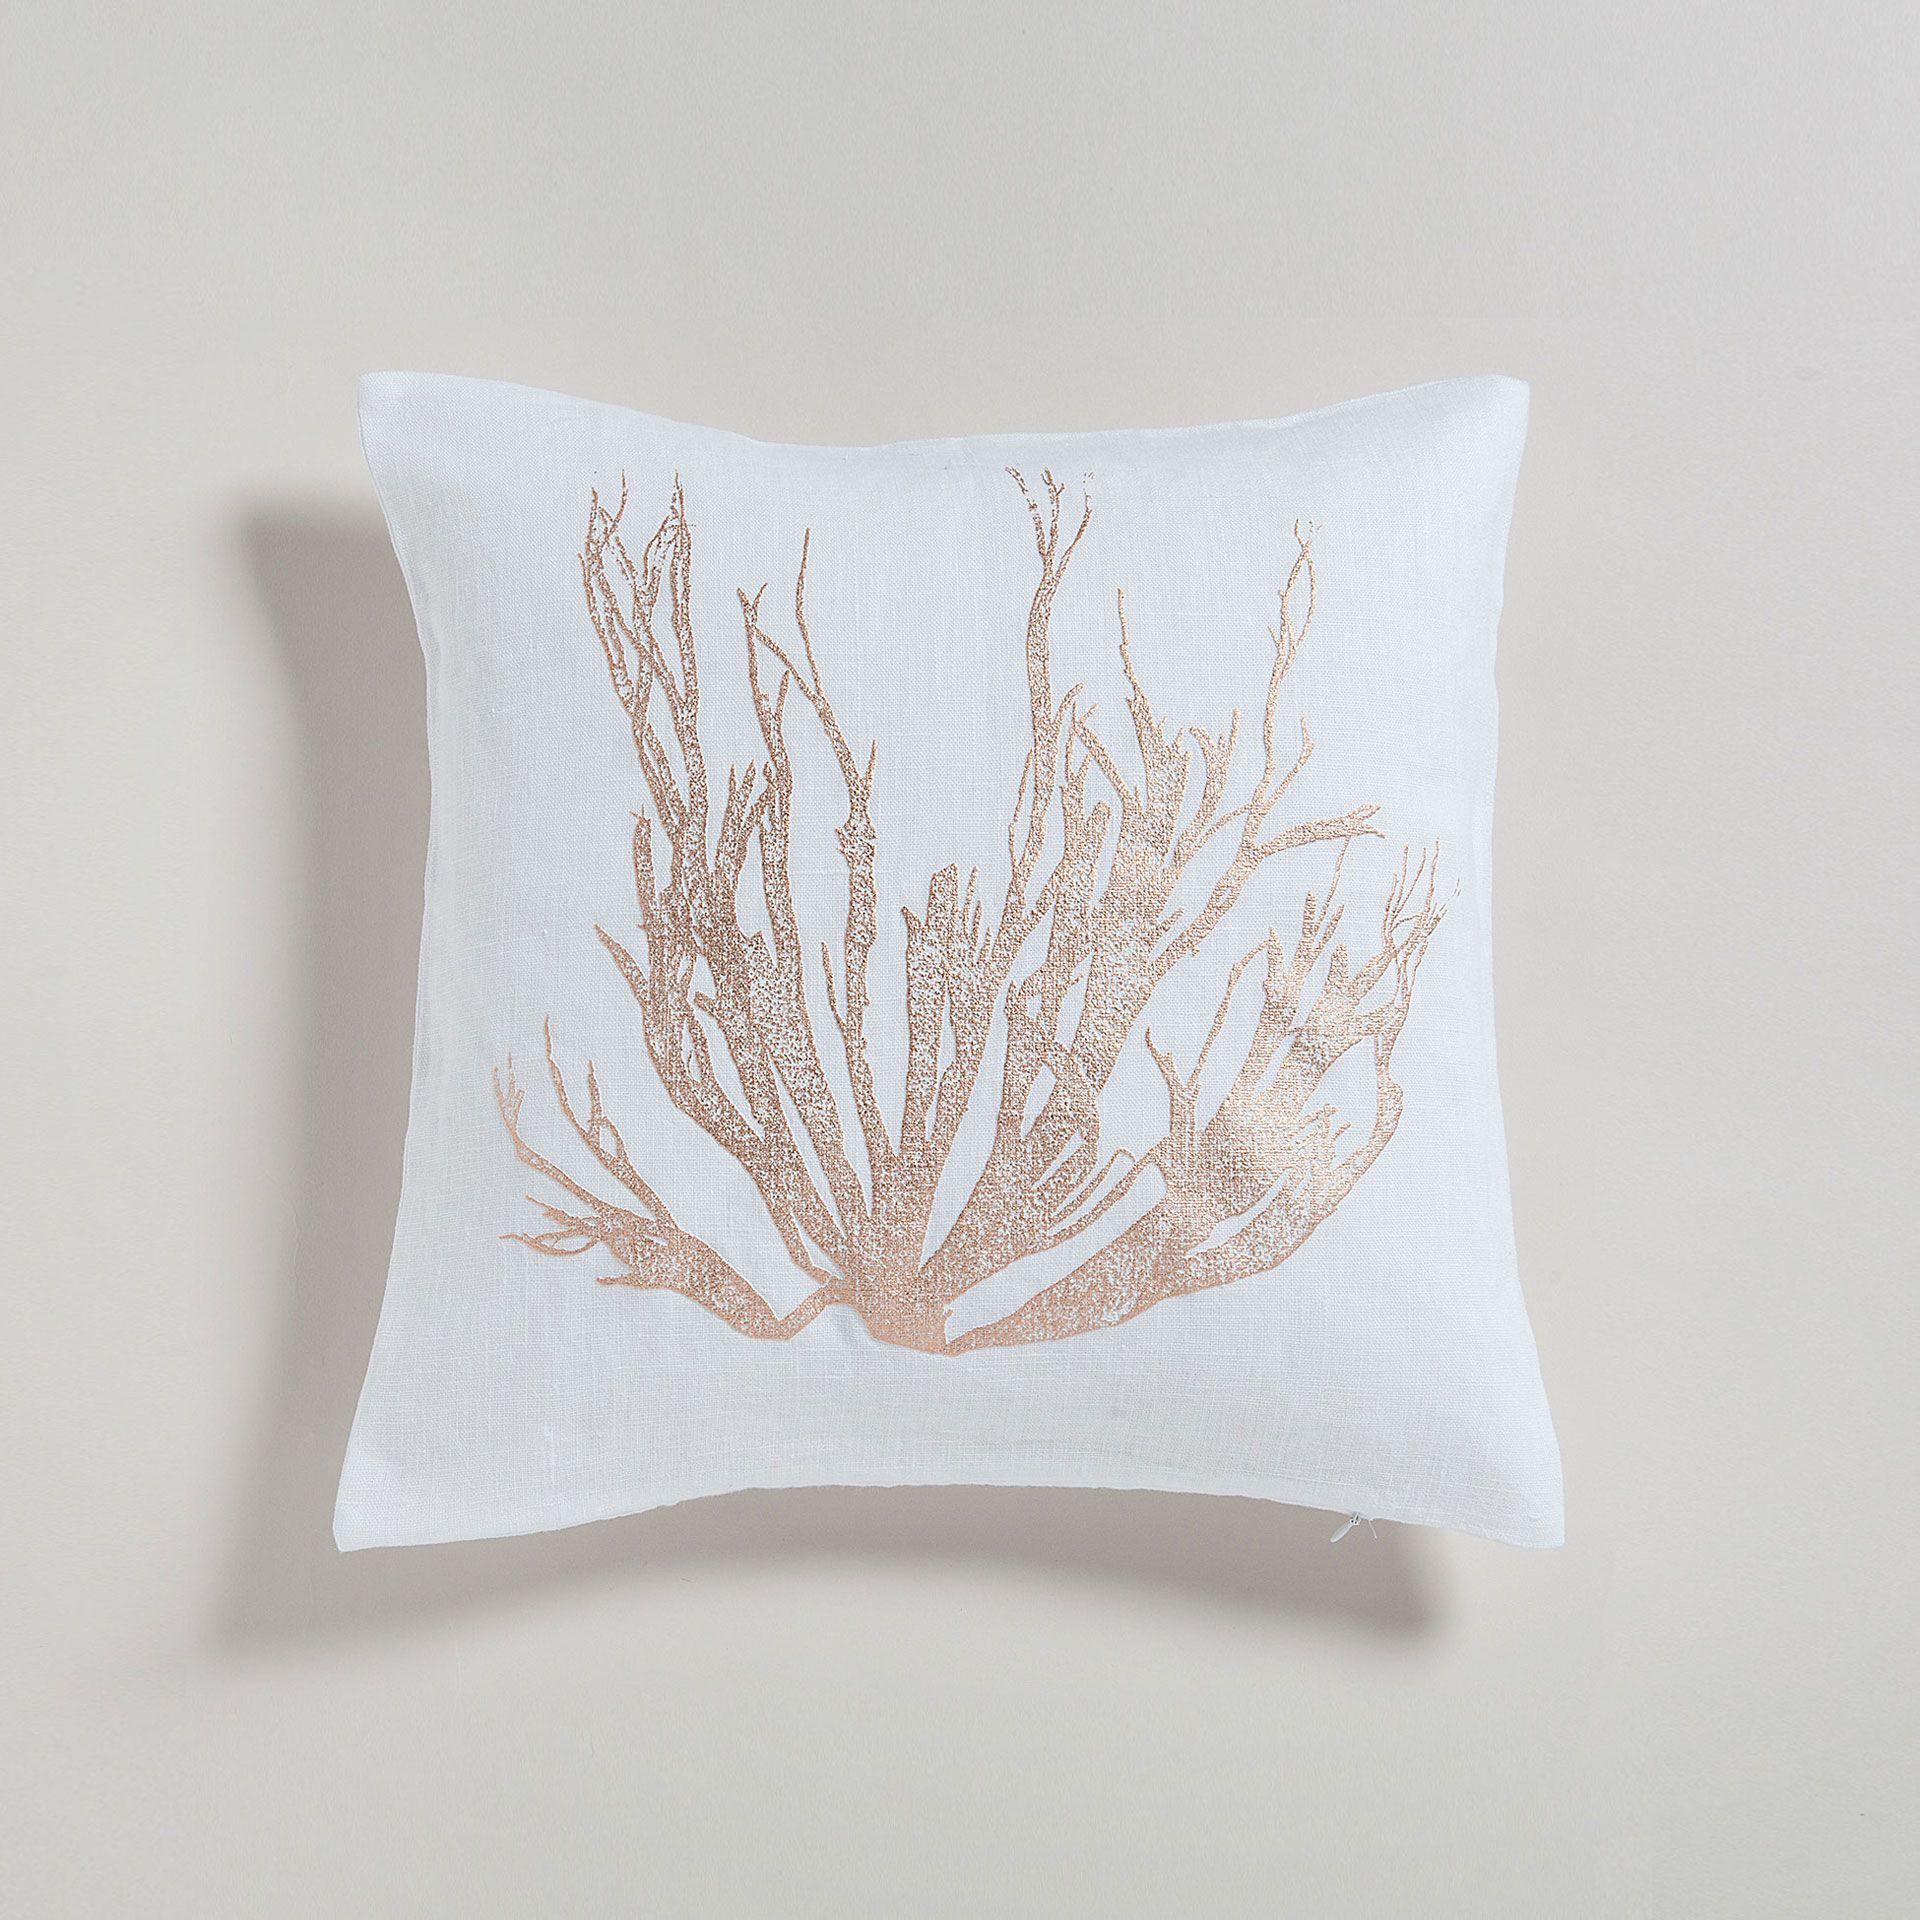 Metallic Coral Print Linen Cushion Cover